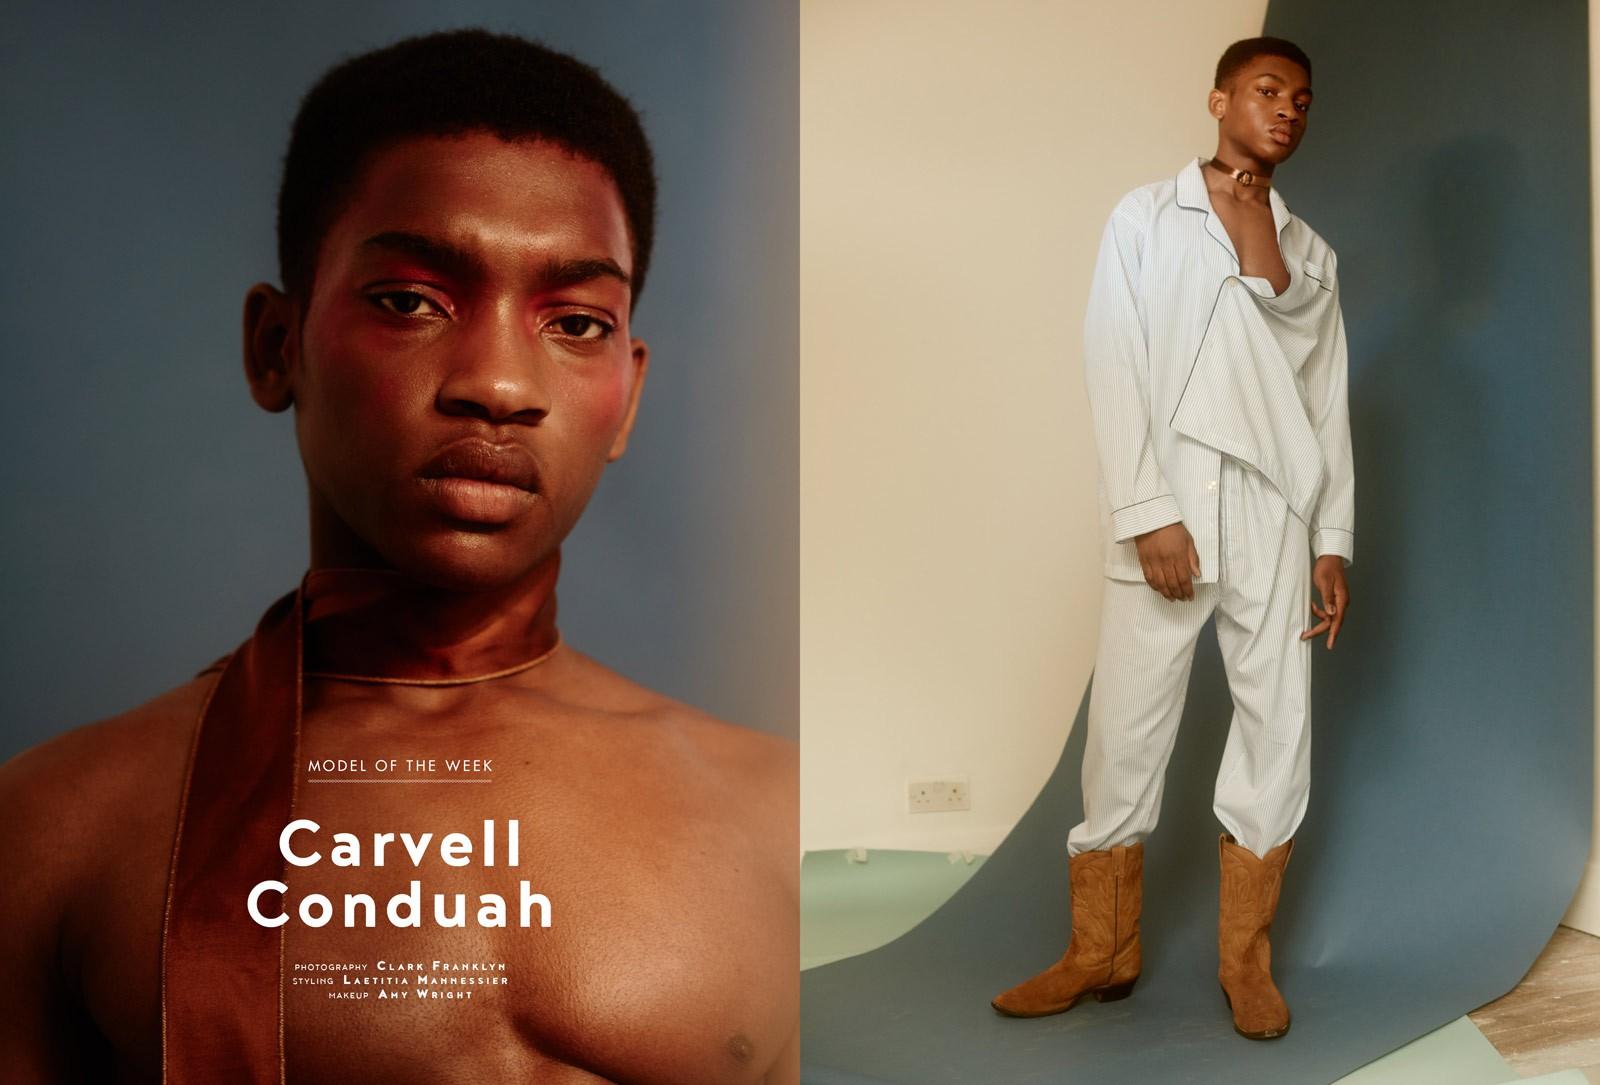 MOTW_CarvellConduah_M1_web-1600_01